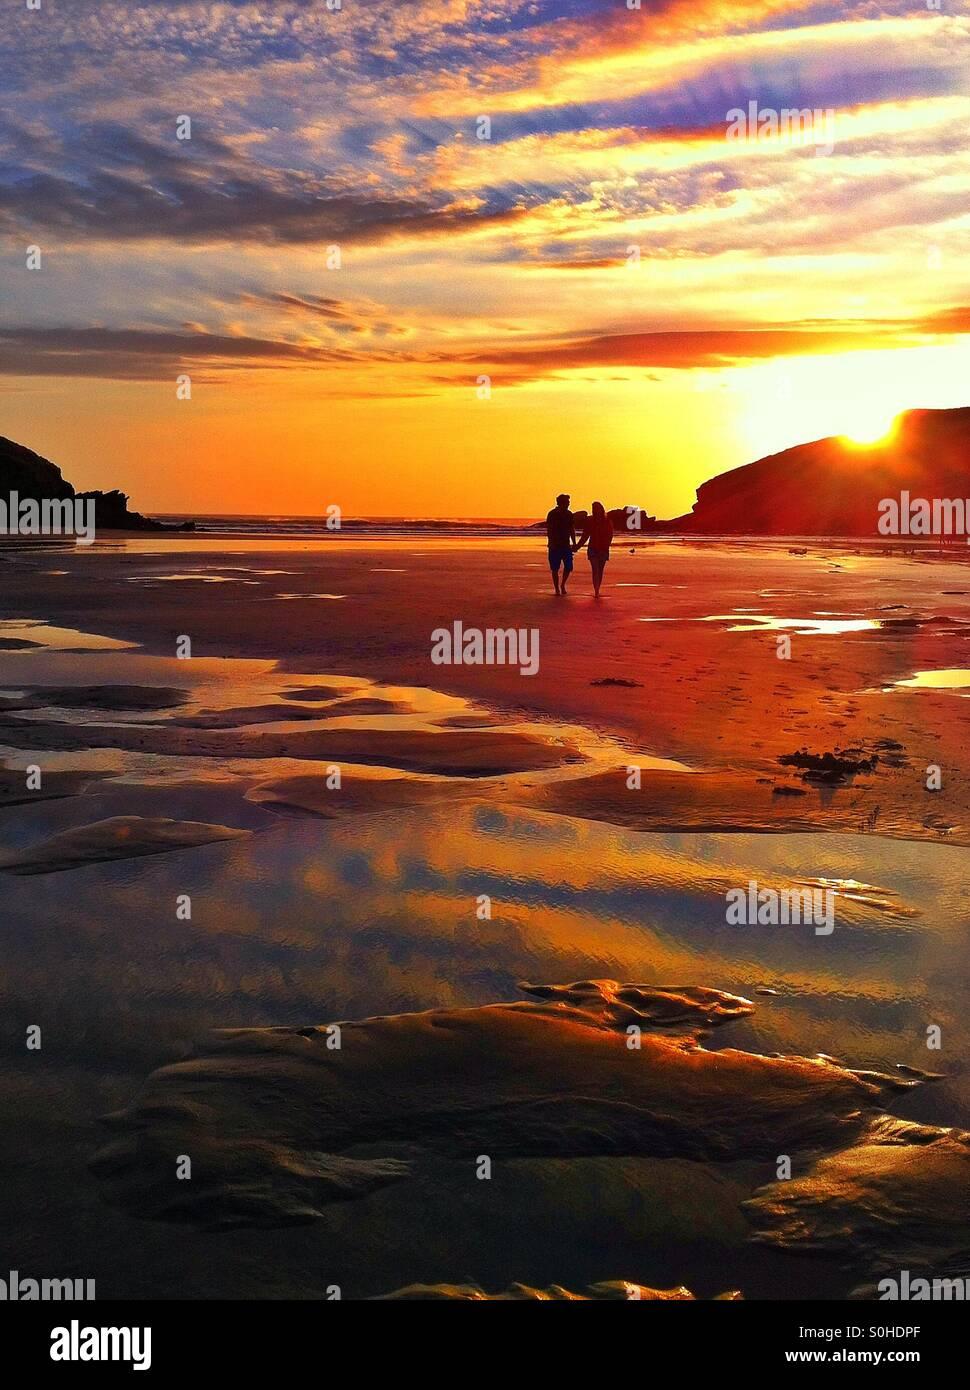 loving-the-sunset-S0HDPF.jpg